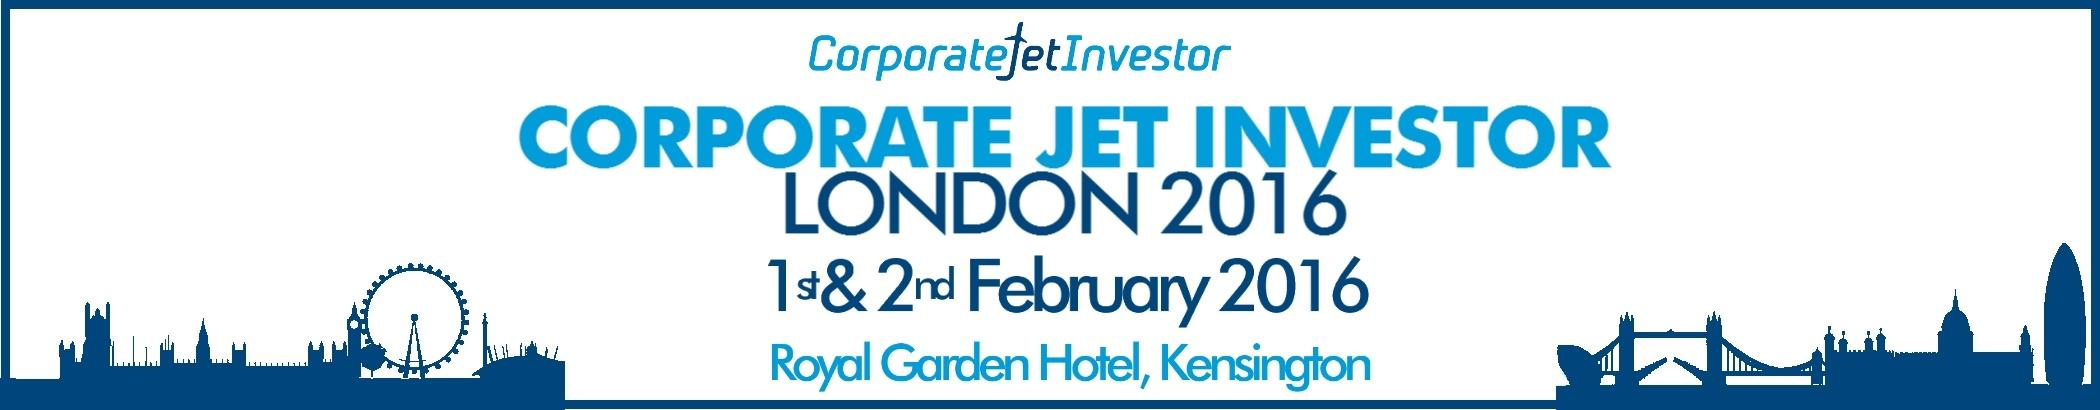 Corporate_Jet_Investor_London_20162.jpg